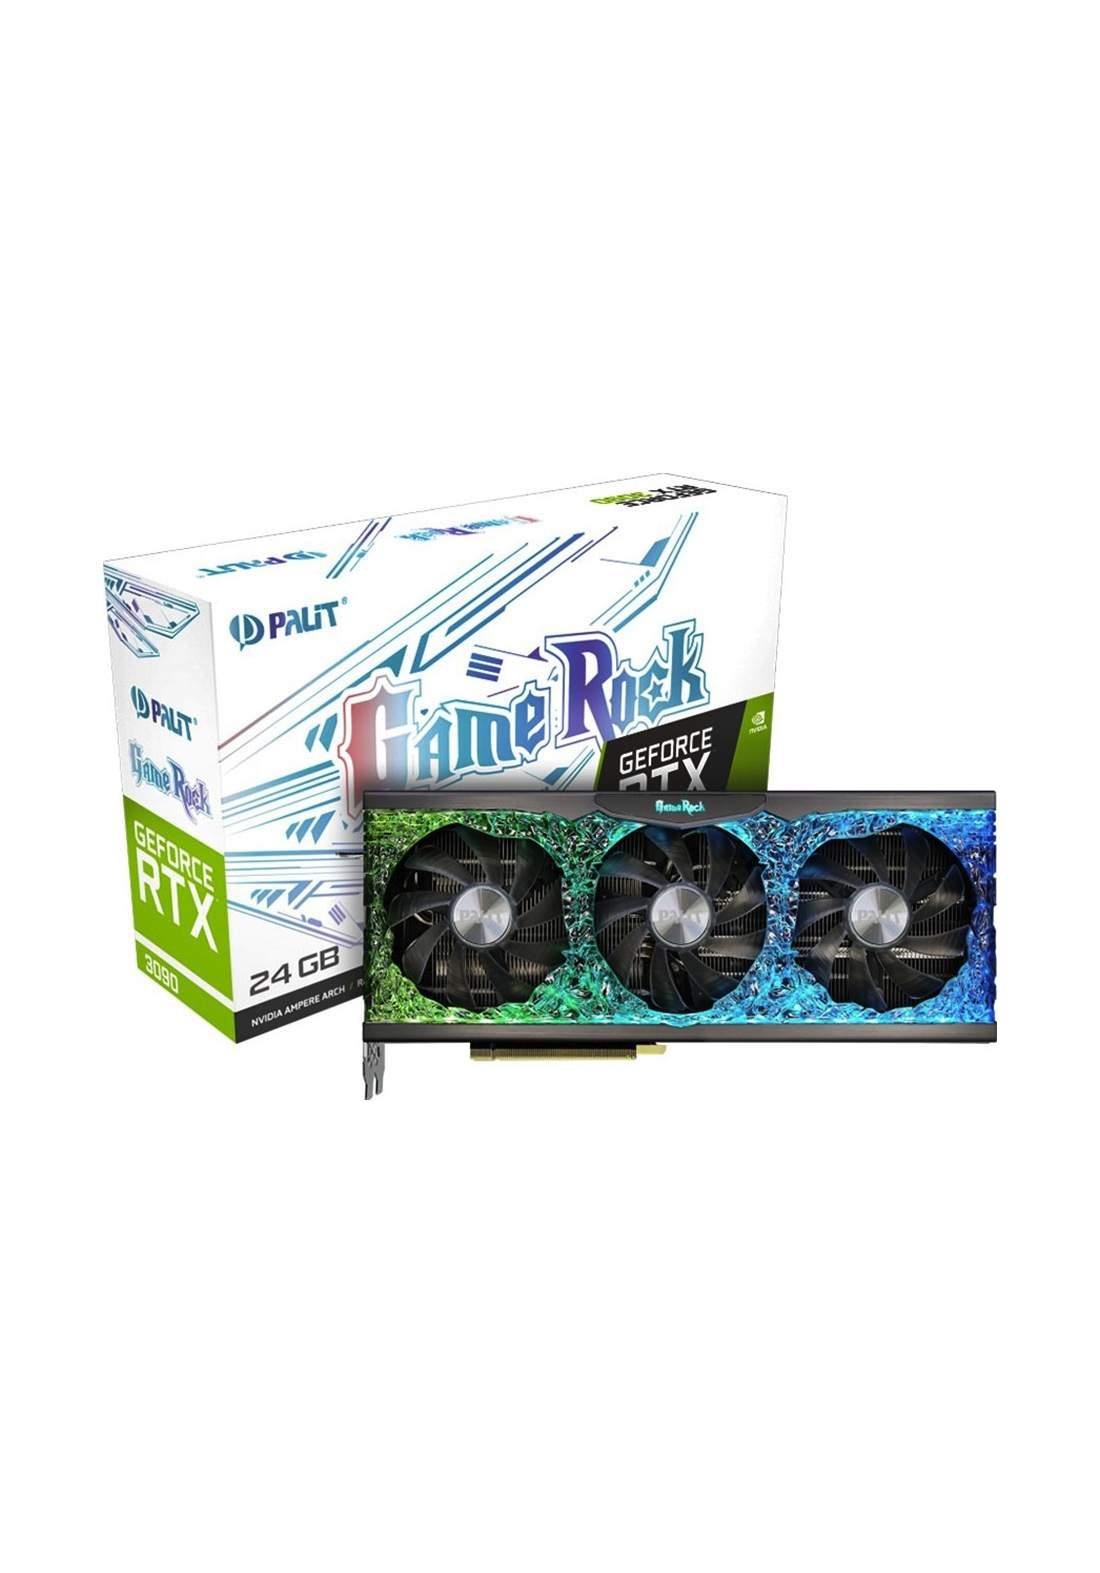 Palit GeForce RTX 3090 GameRock OC 24GB Graphics Card